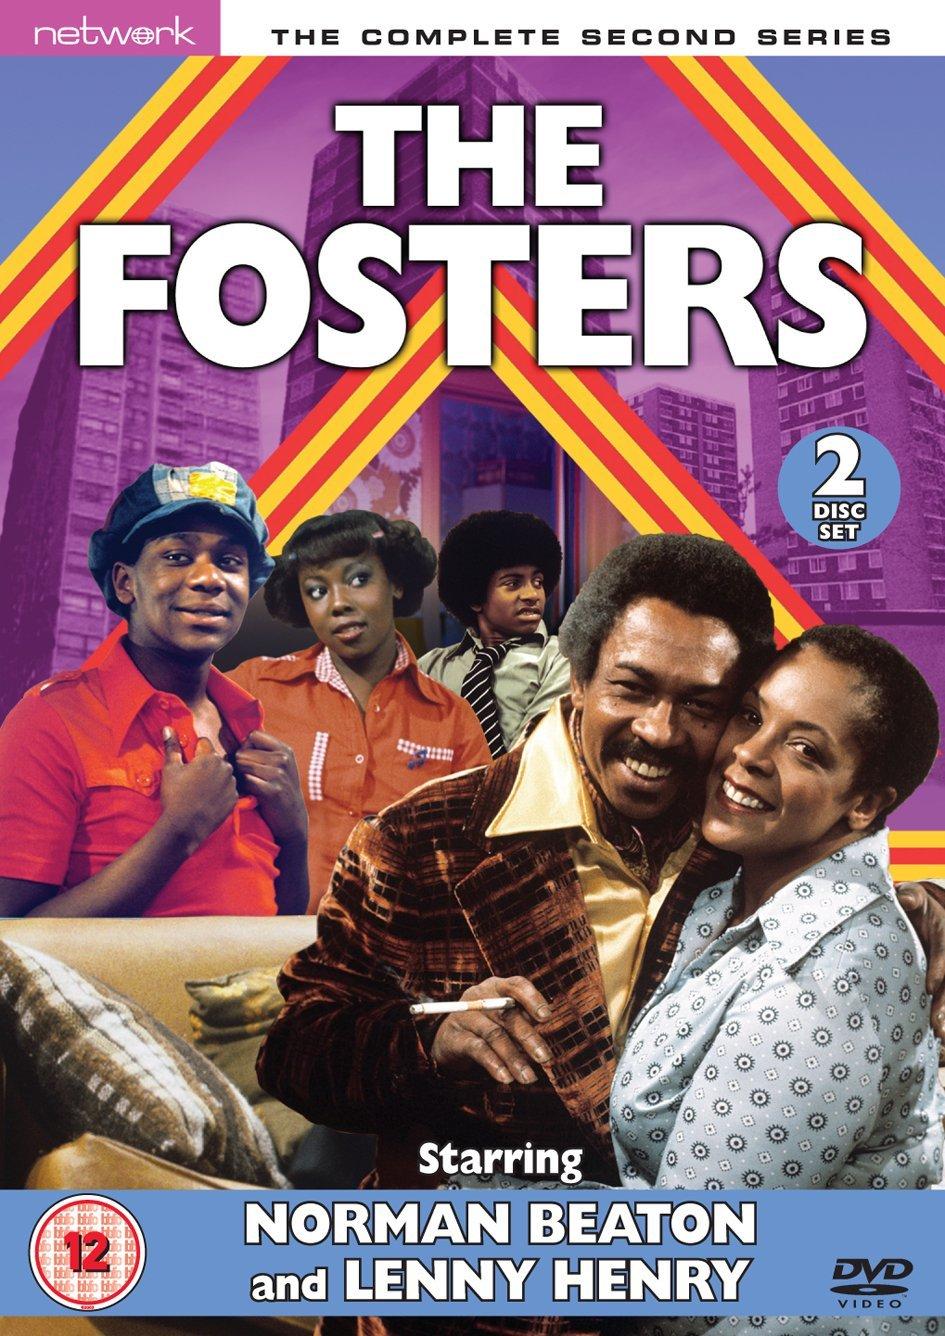 The Fosters (TV Series 1976–1977) - IMDb